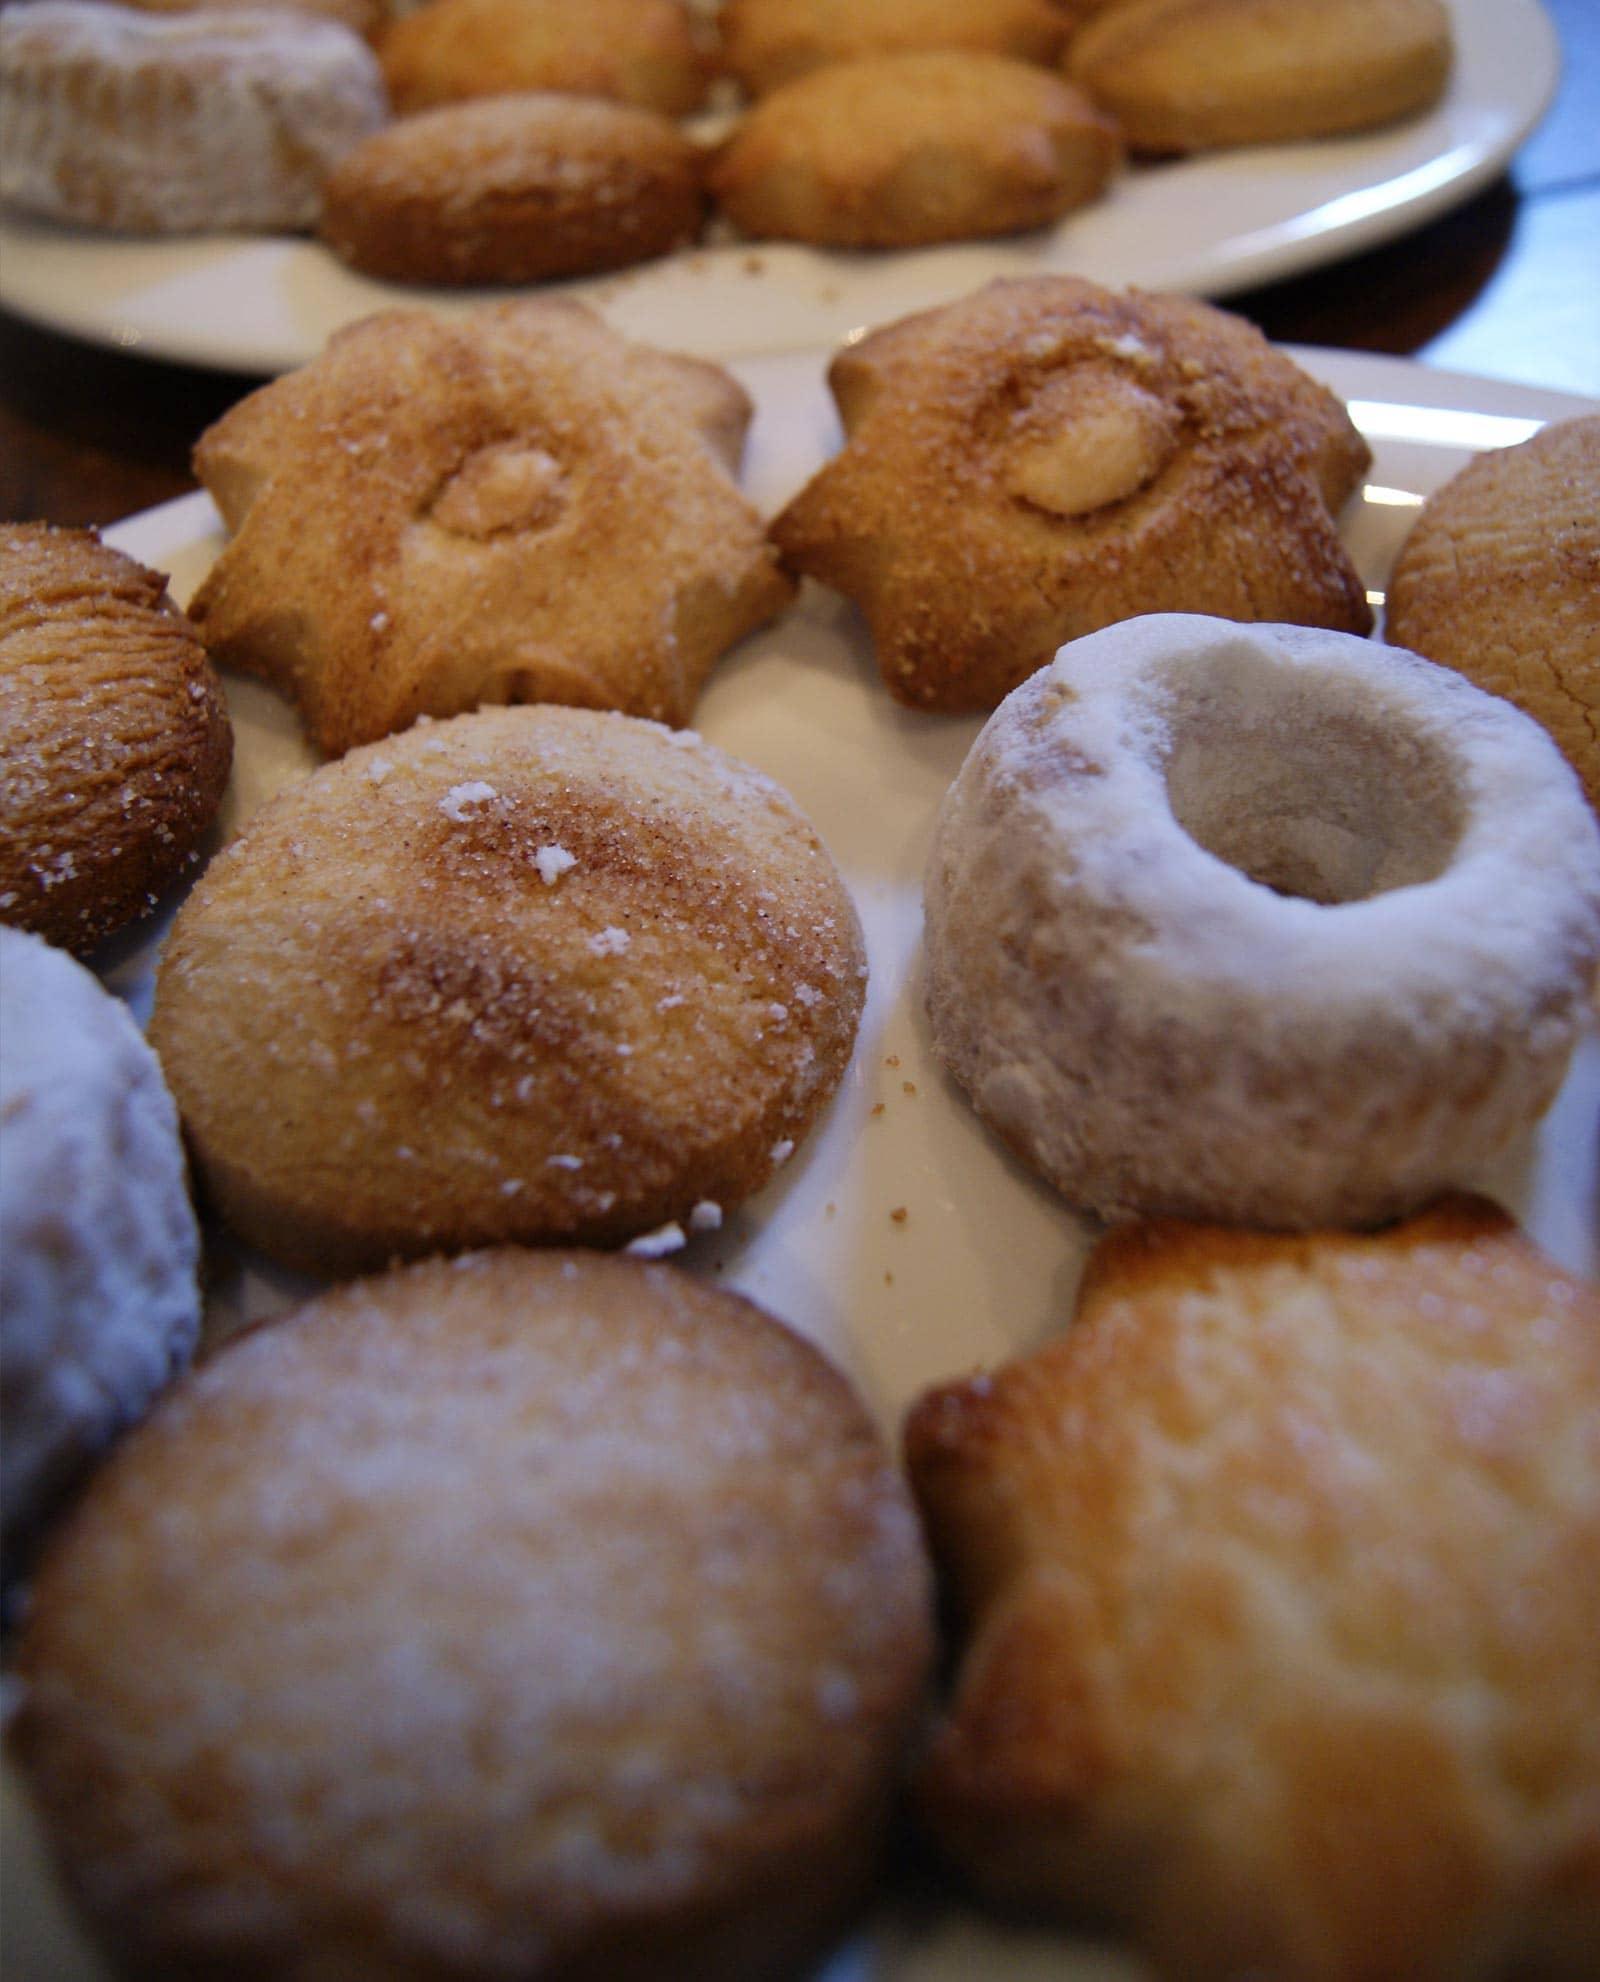 Dulces castellanos en las Bodegas Valduero de la Ribera del Duero